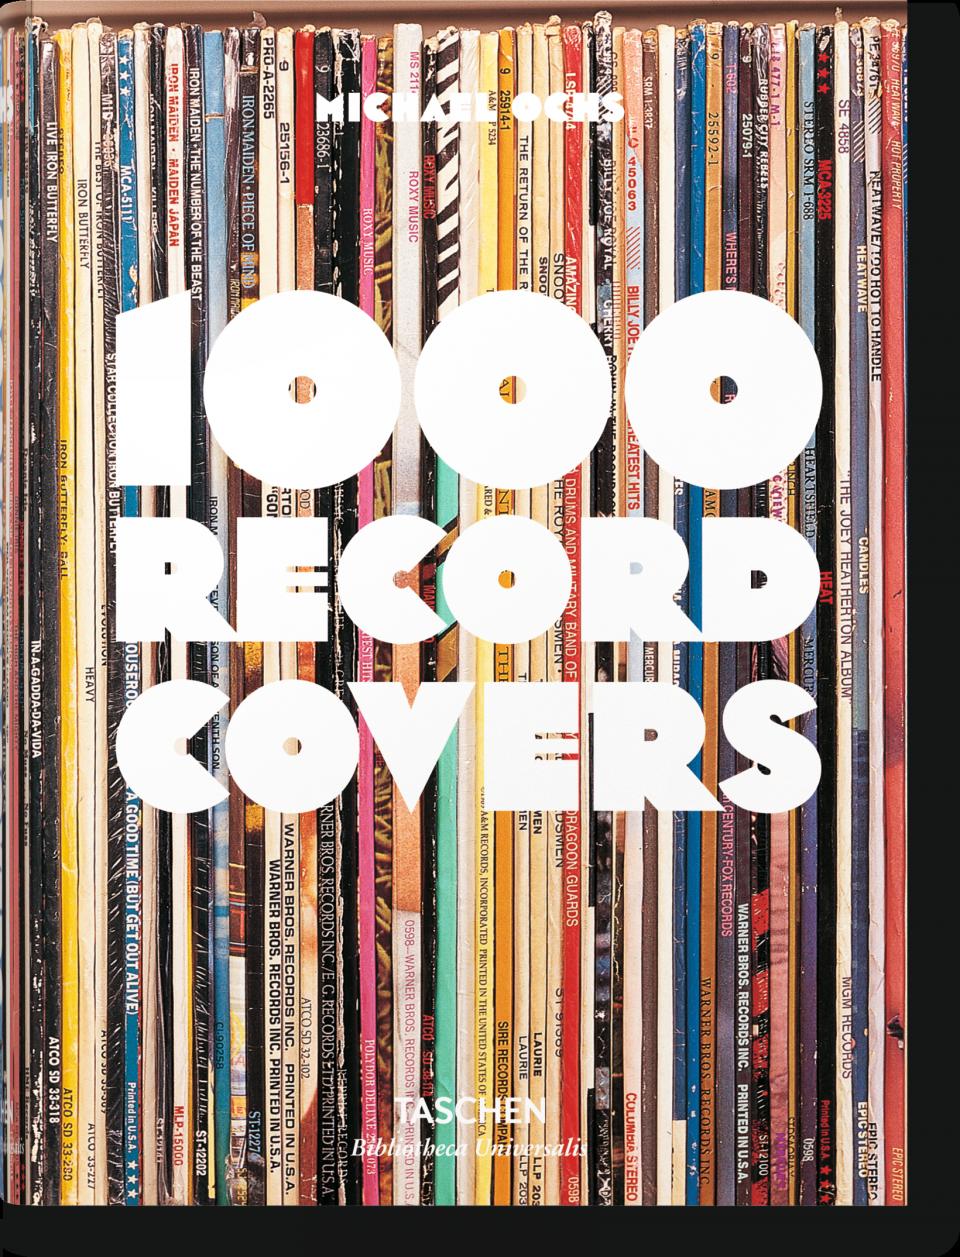 1000 Record Covers Bibliotheca Universalis